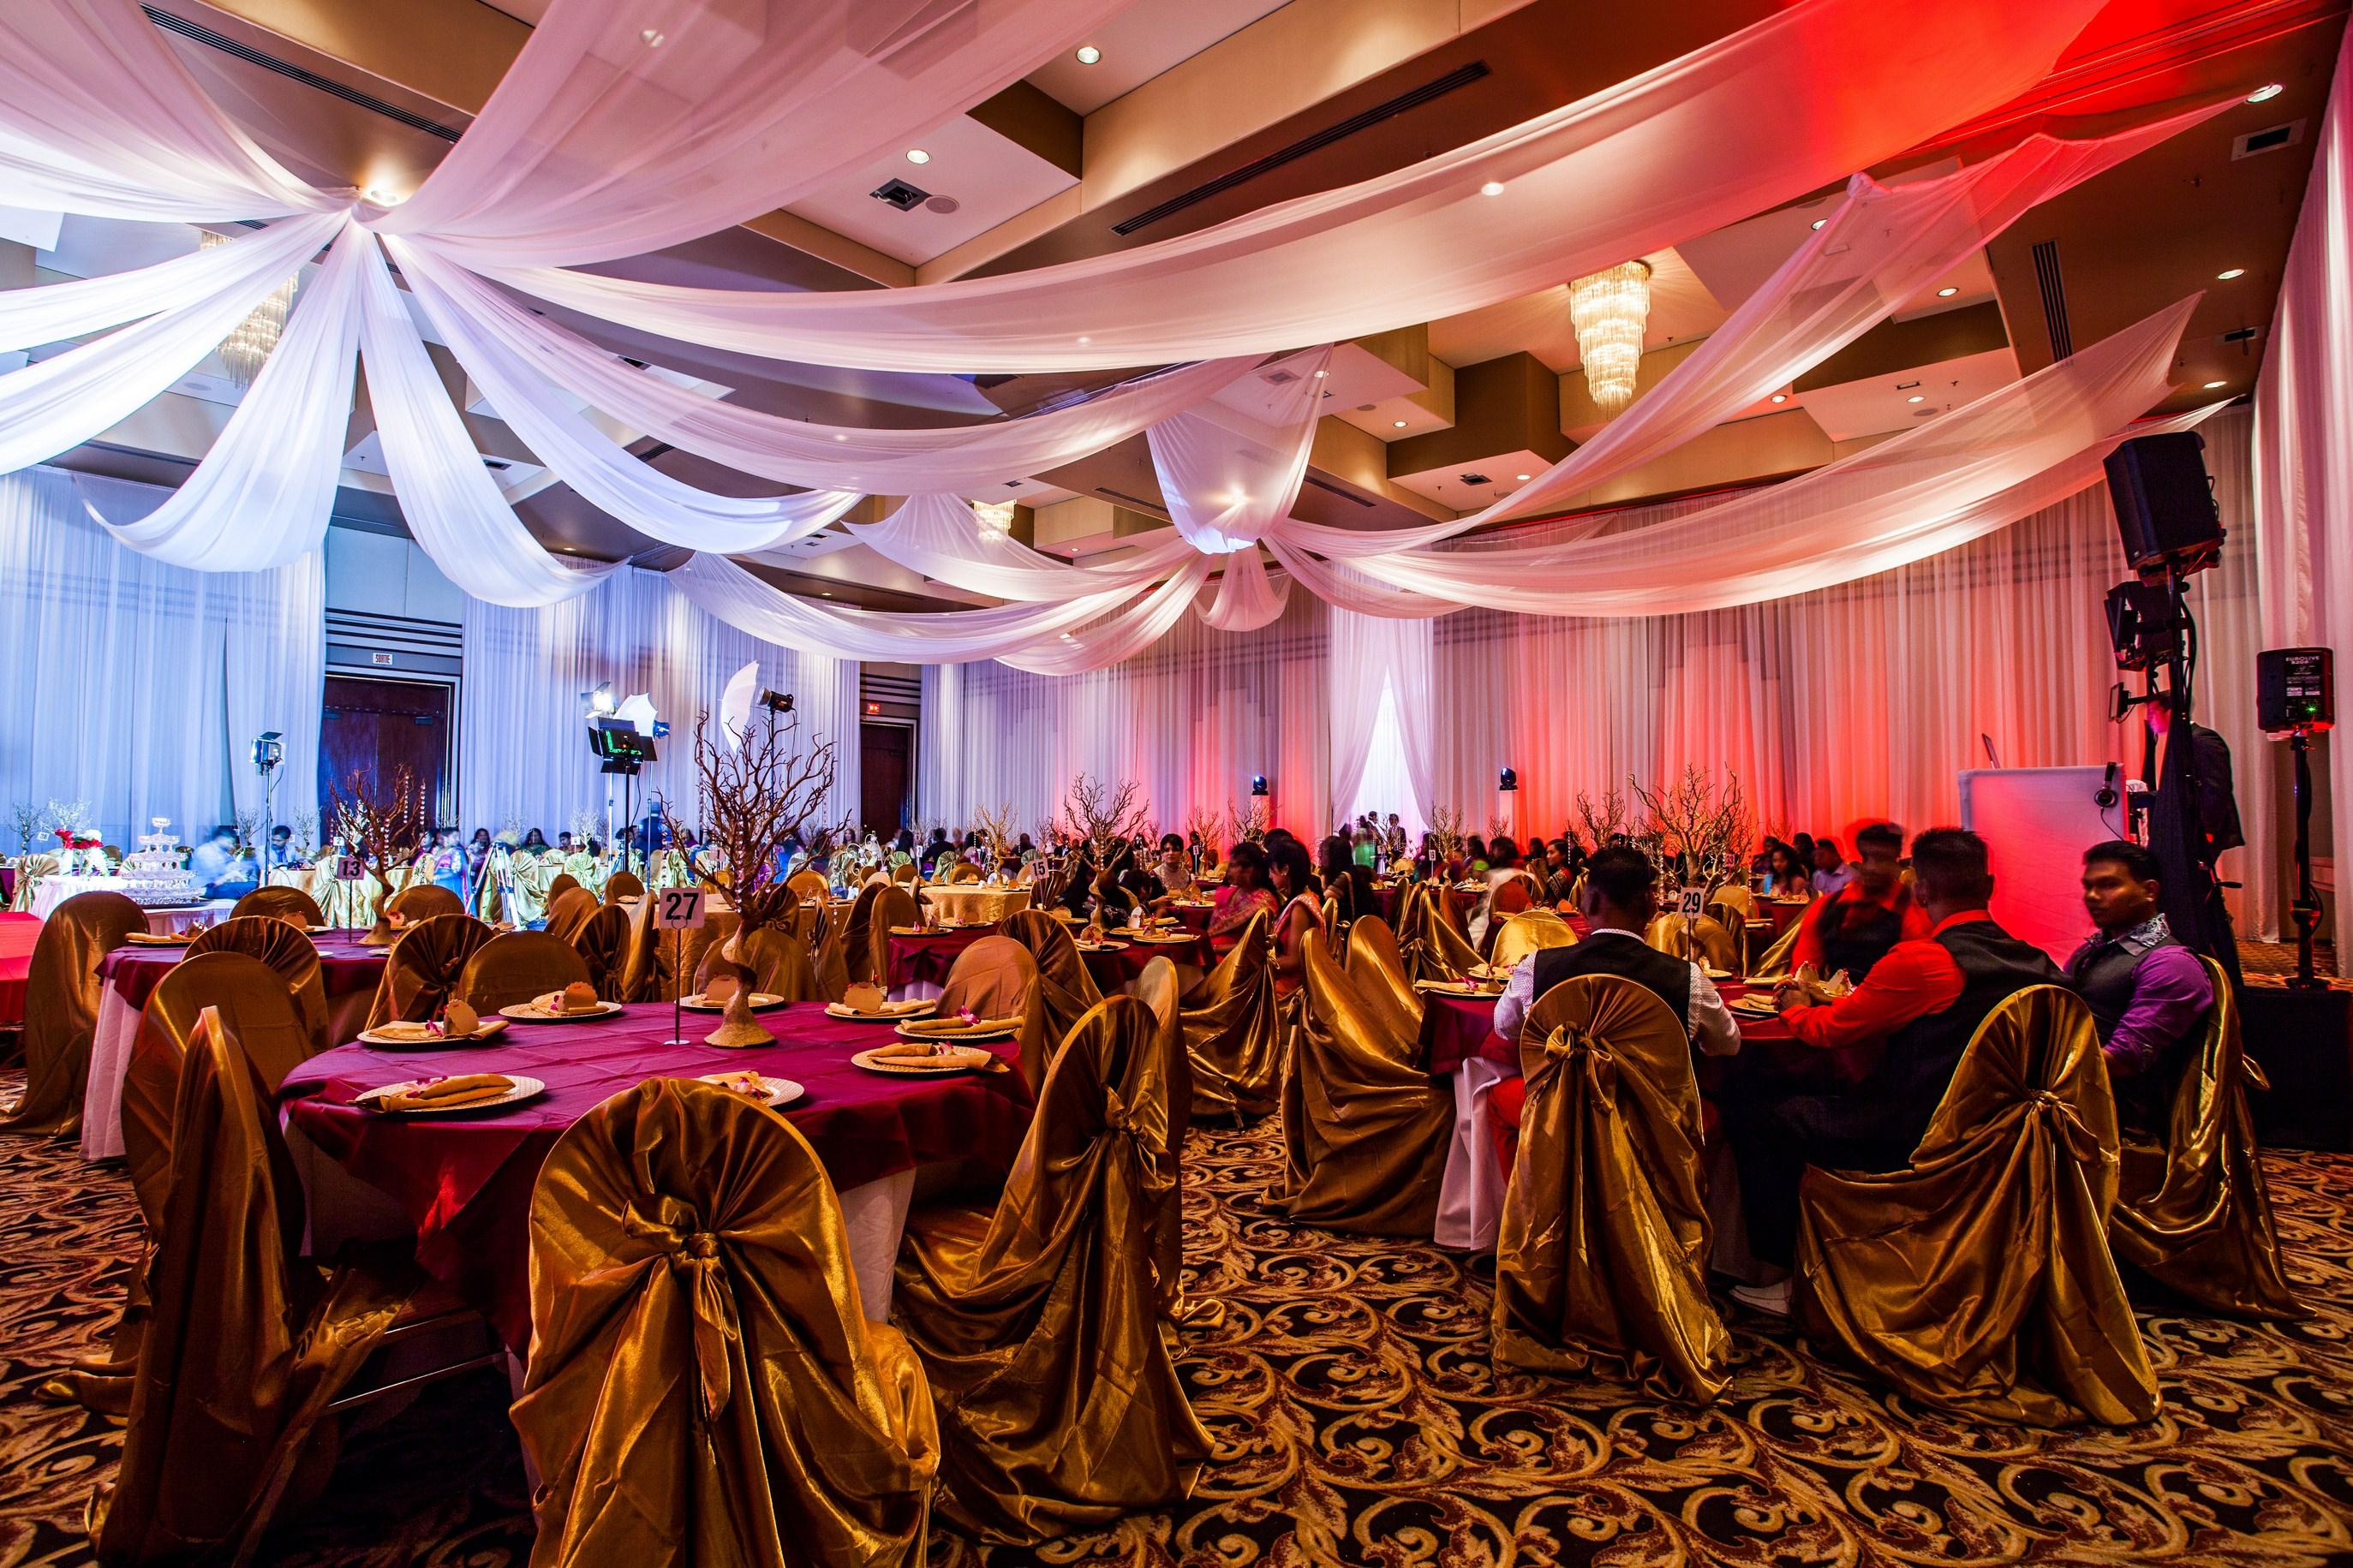 chateau royal laval tamil wedding for jeetha sasi uptown xpress montreal wedding dj 514